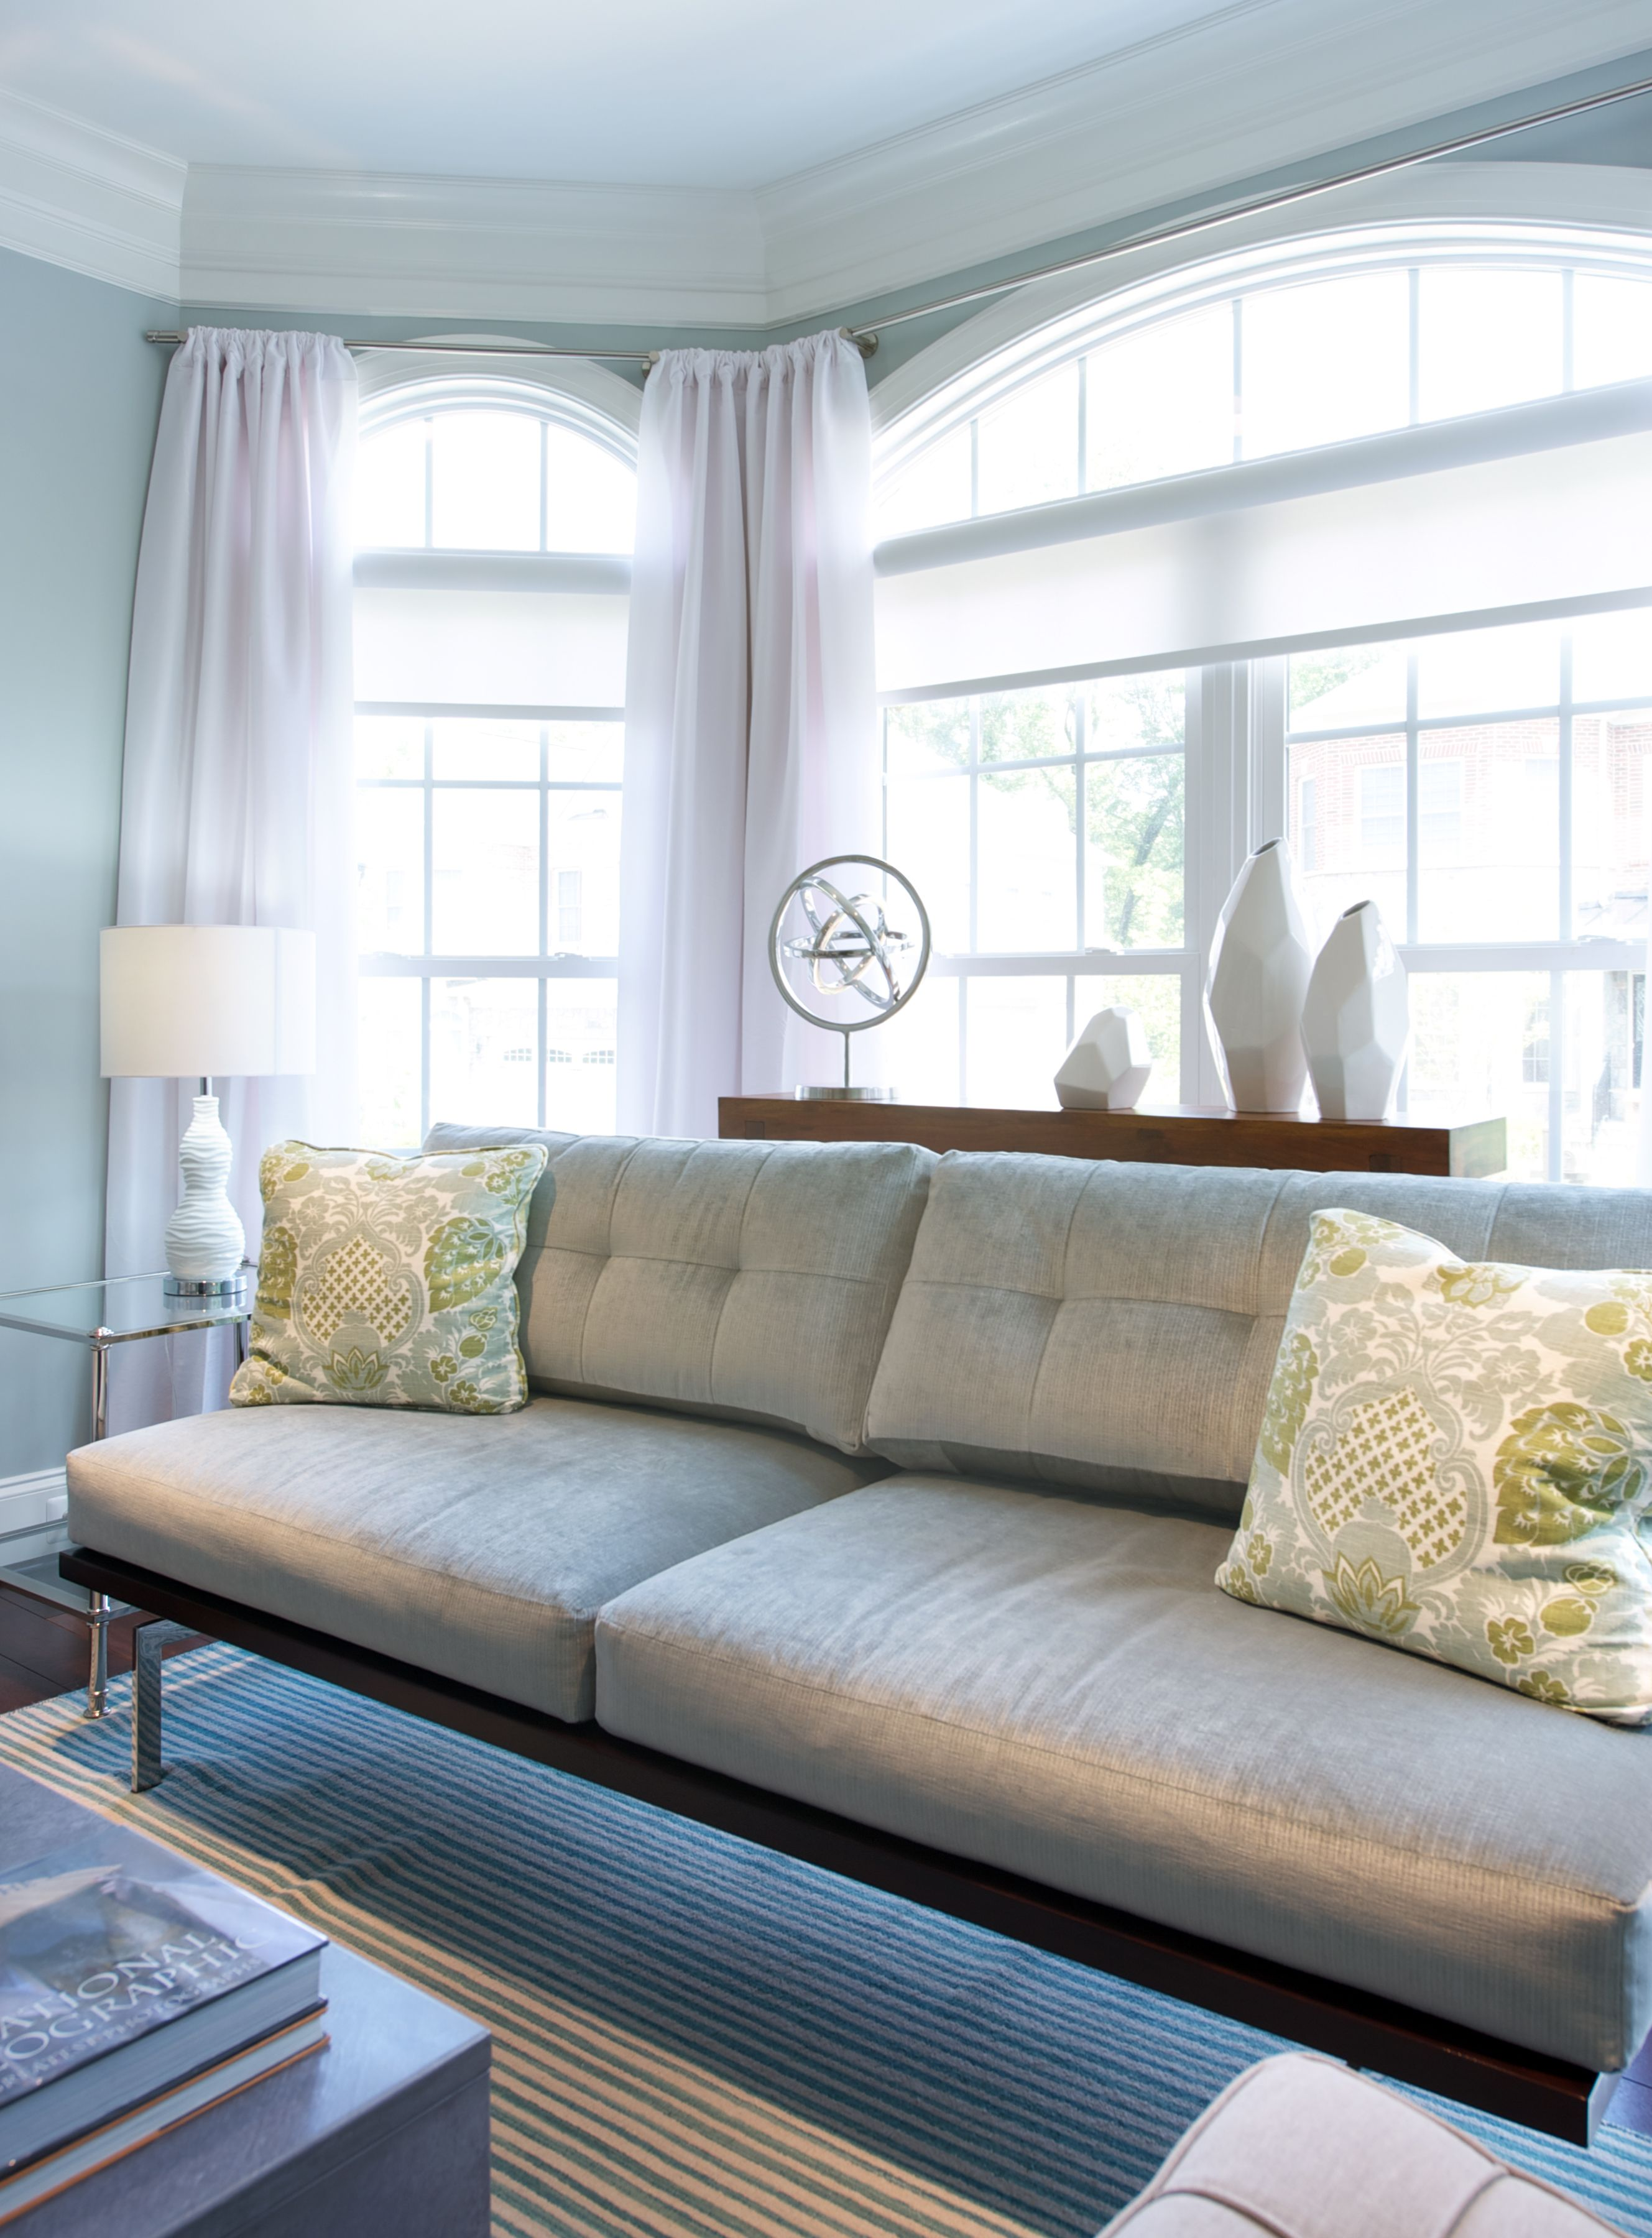 Vanguard Living Room Furniture: Vanguard Furniture Sofa In Modern Living Room Design By